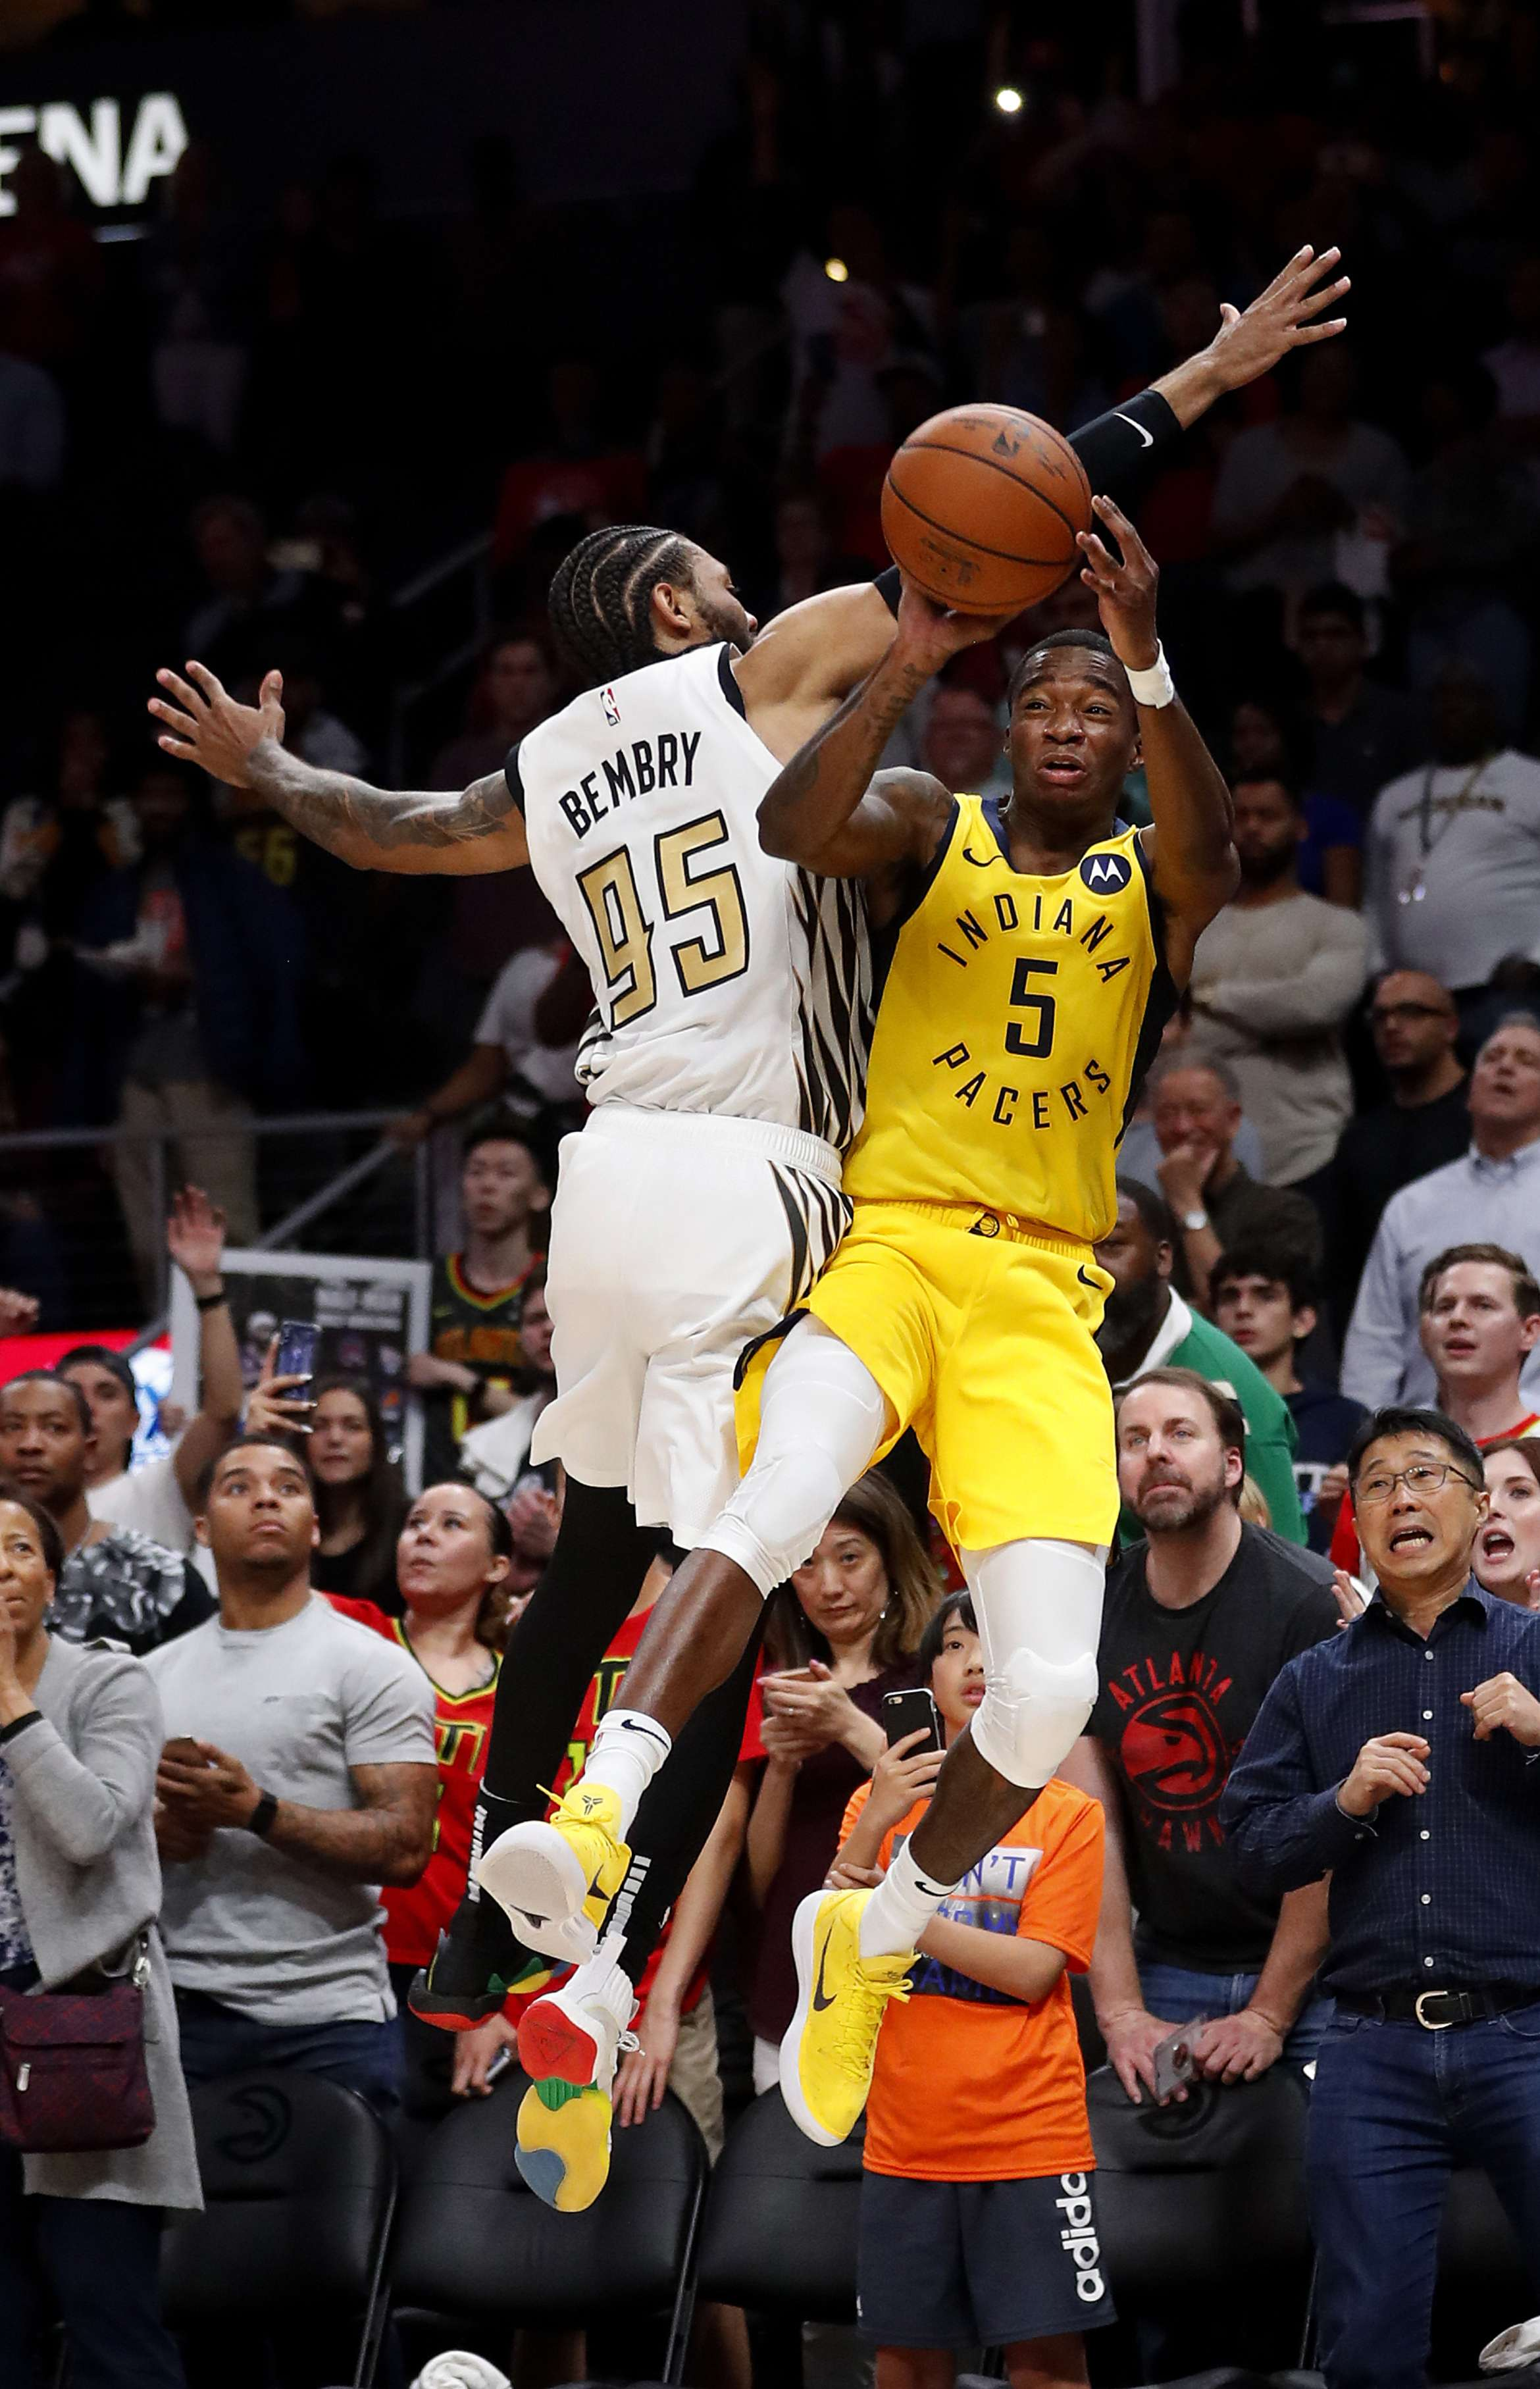 Sumner da a Pacers triunfo de último segundo sobre Hawks